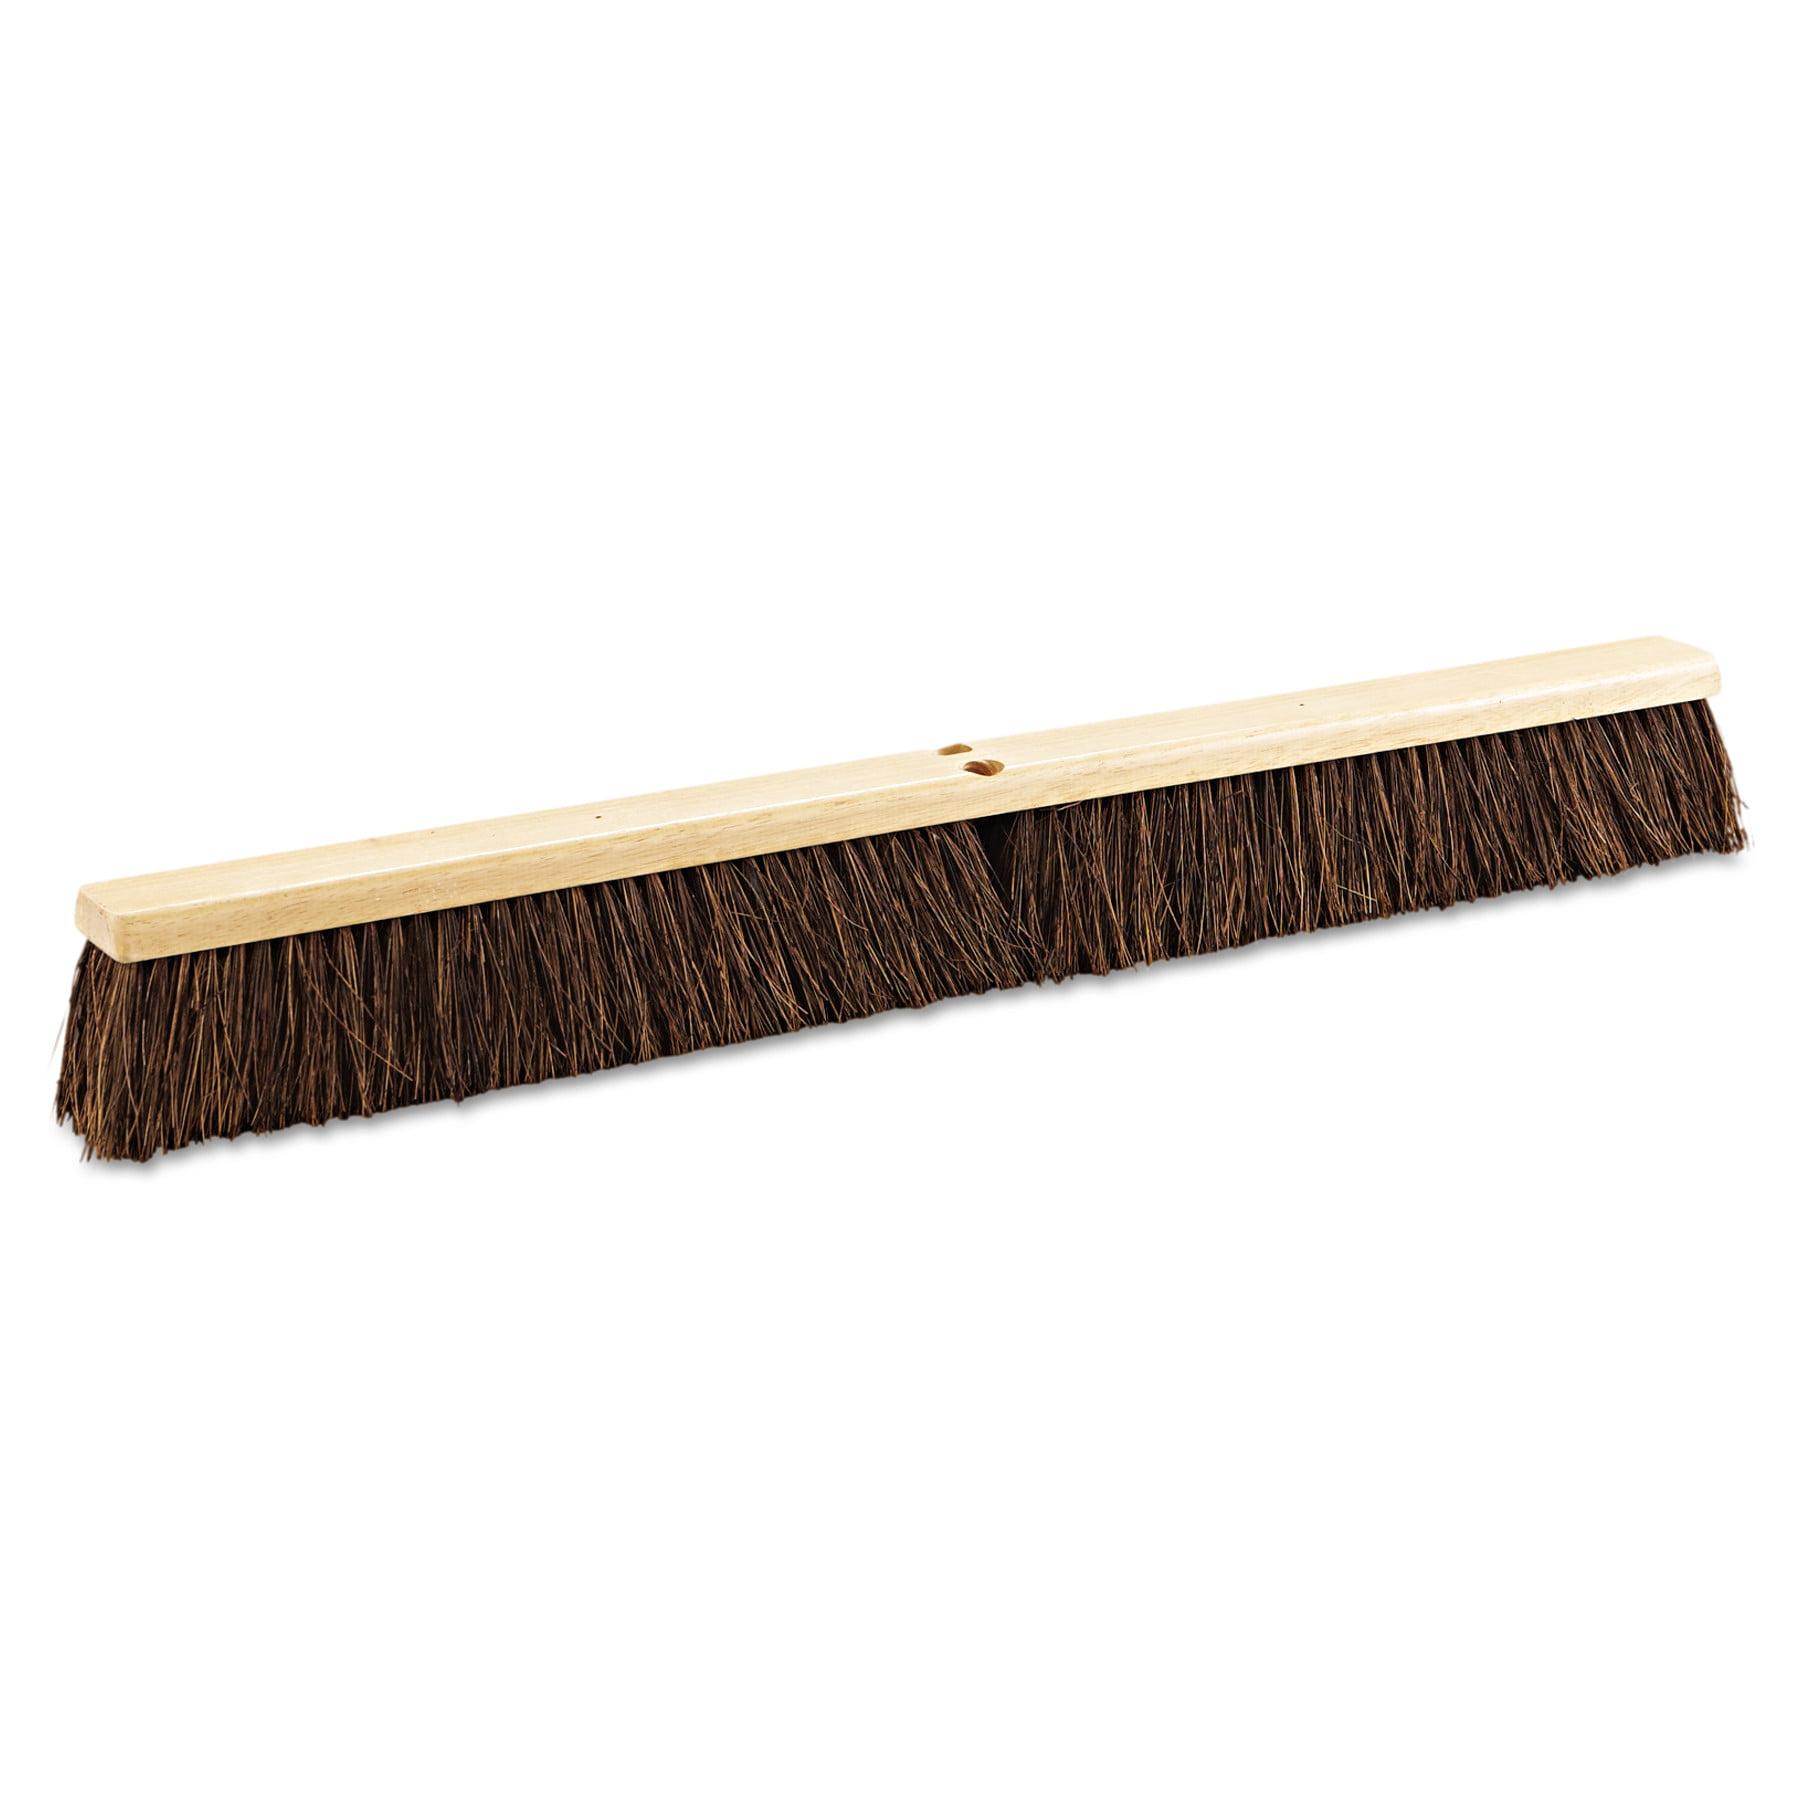 "Boardwalk Floor Brush Head, 36"" Wide, Palmyra Bristles by BOARDWALK"